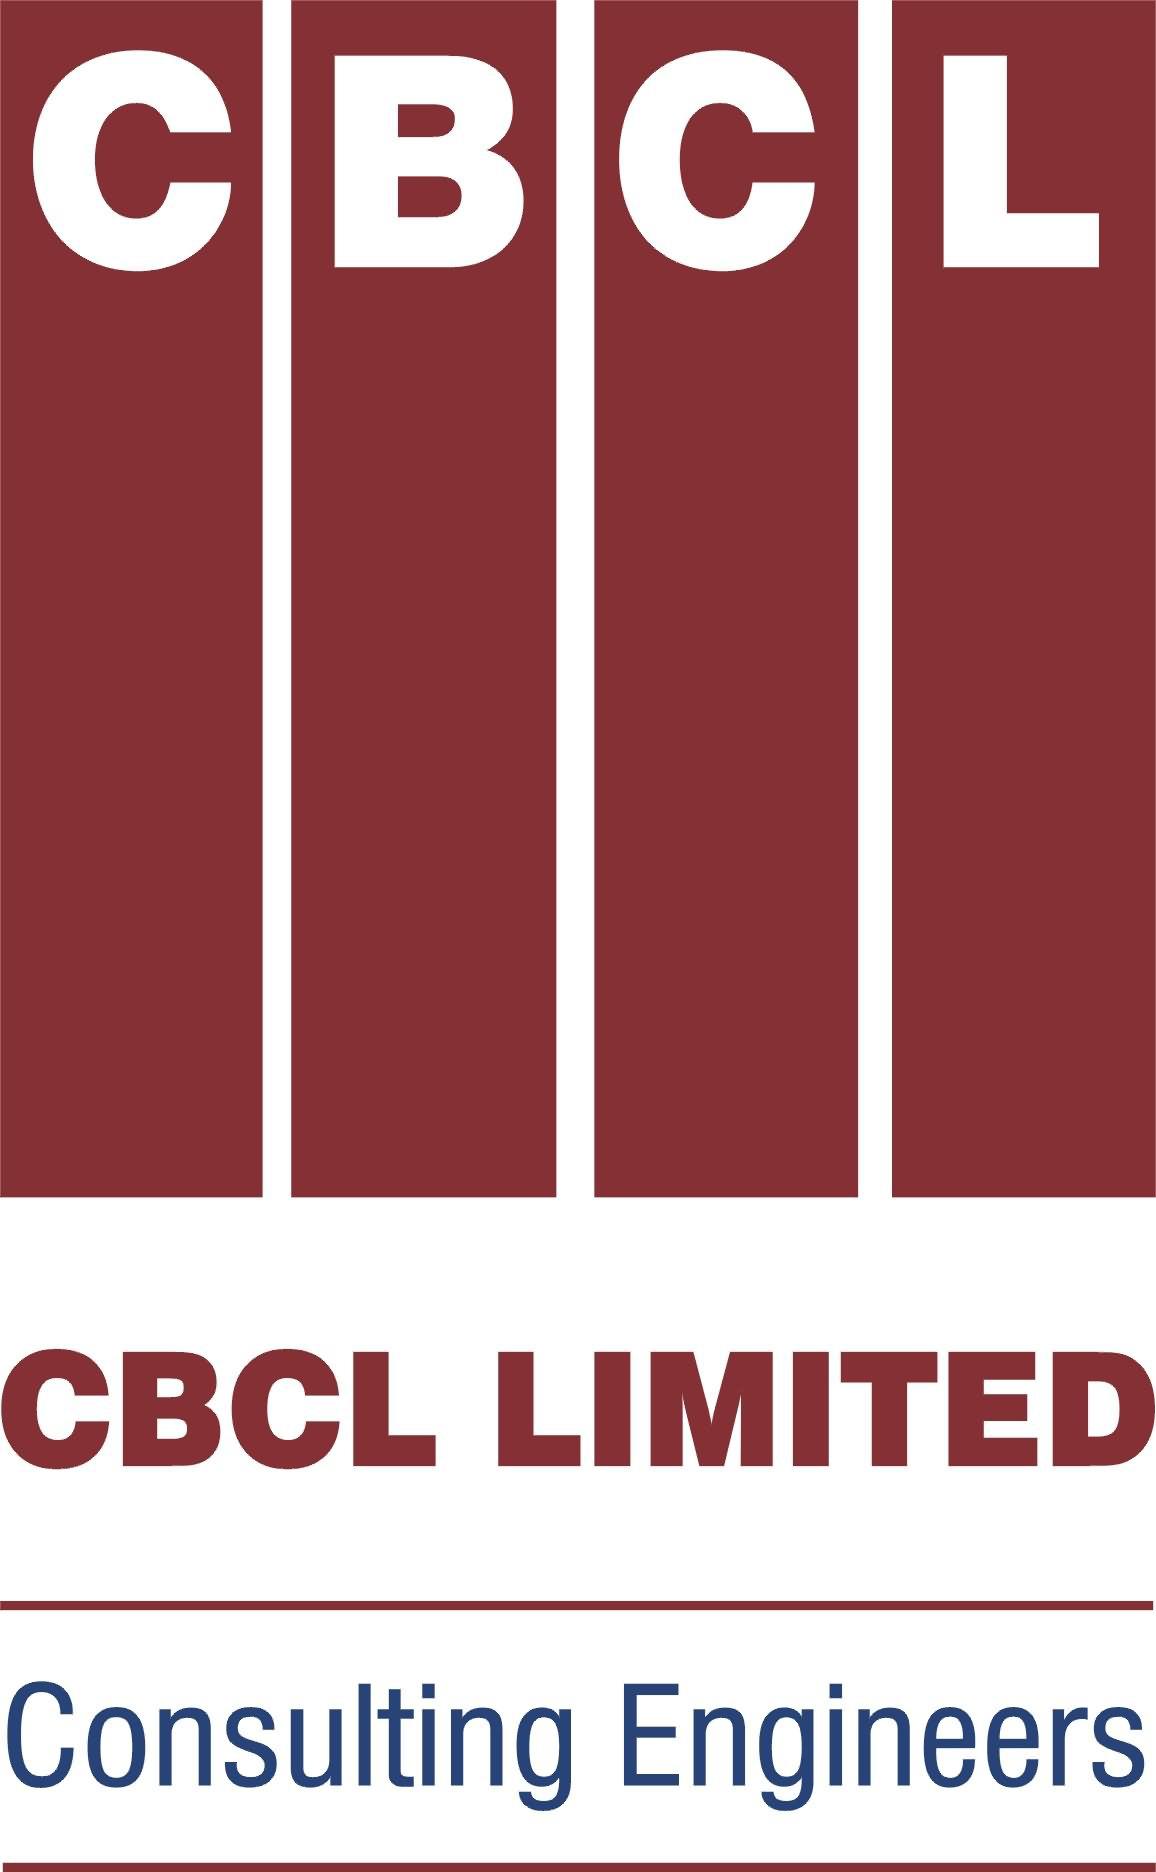 CBCL Limited company